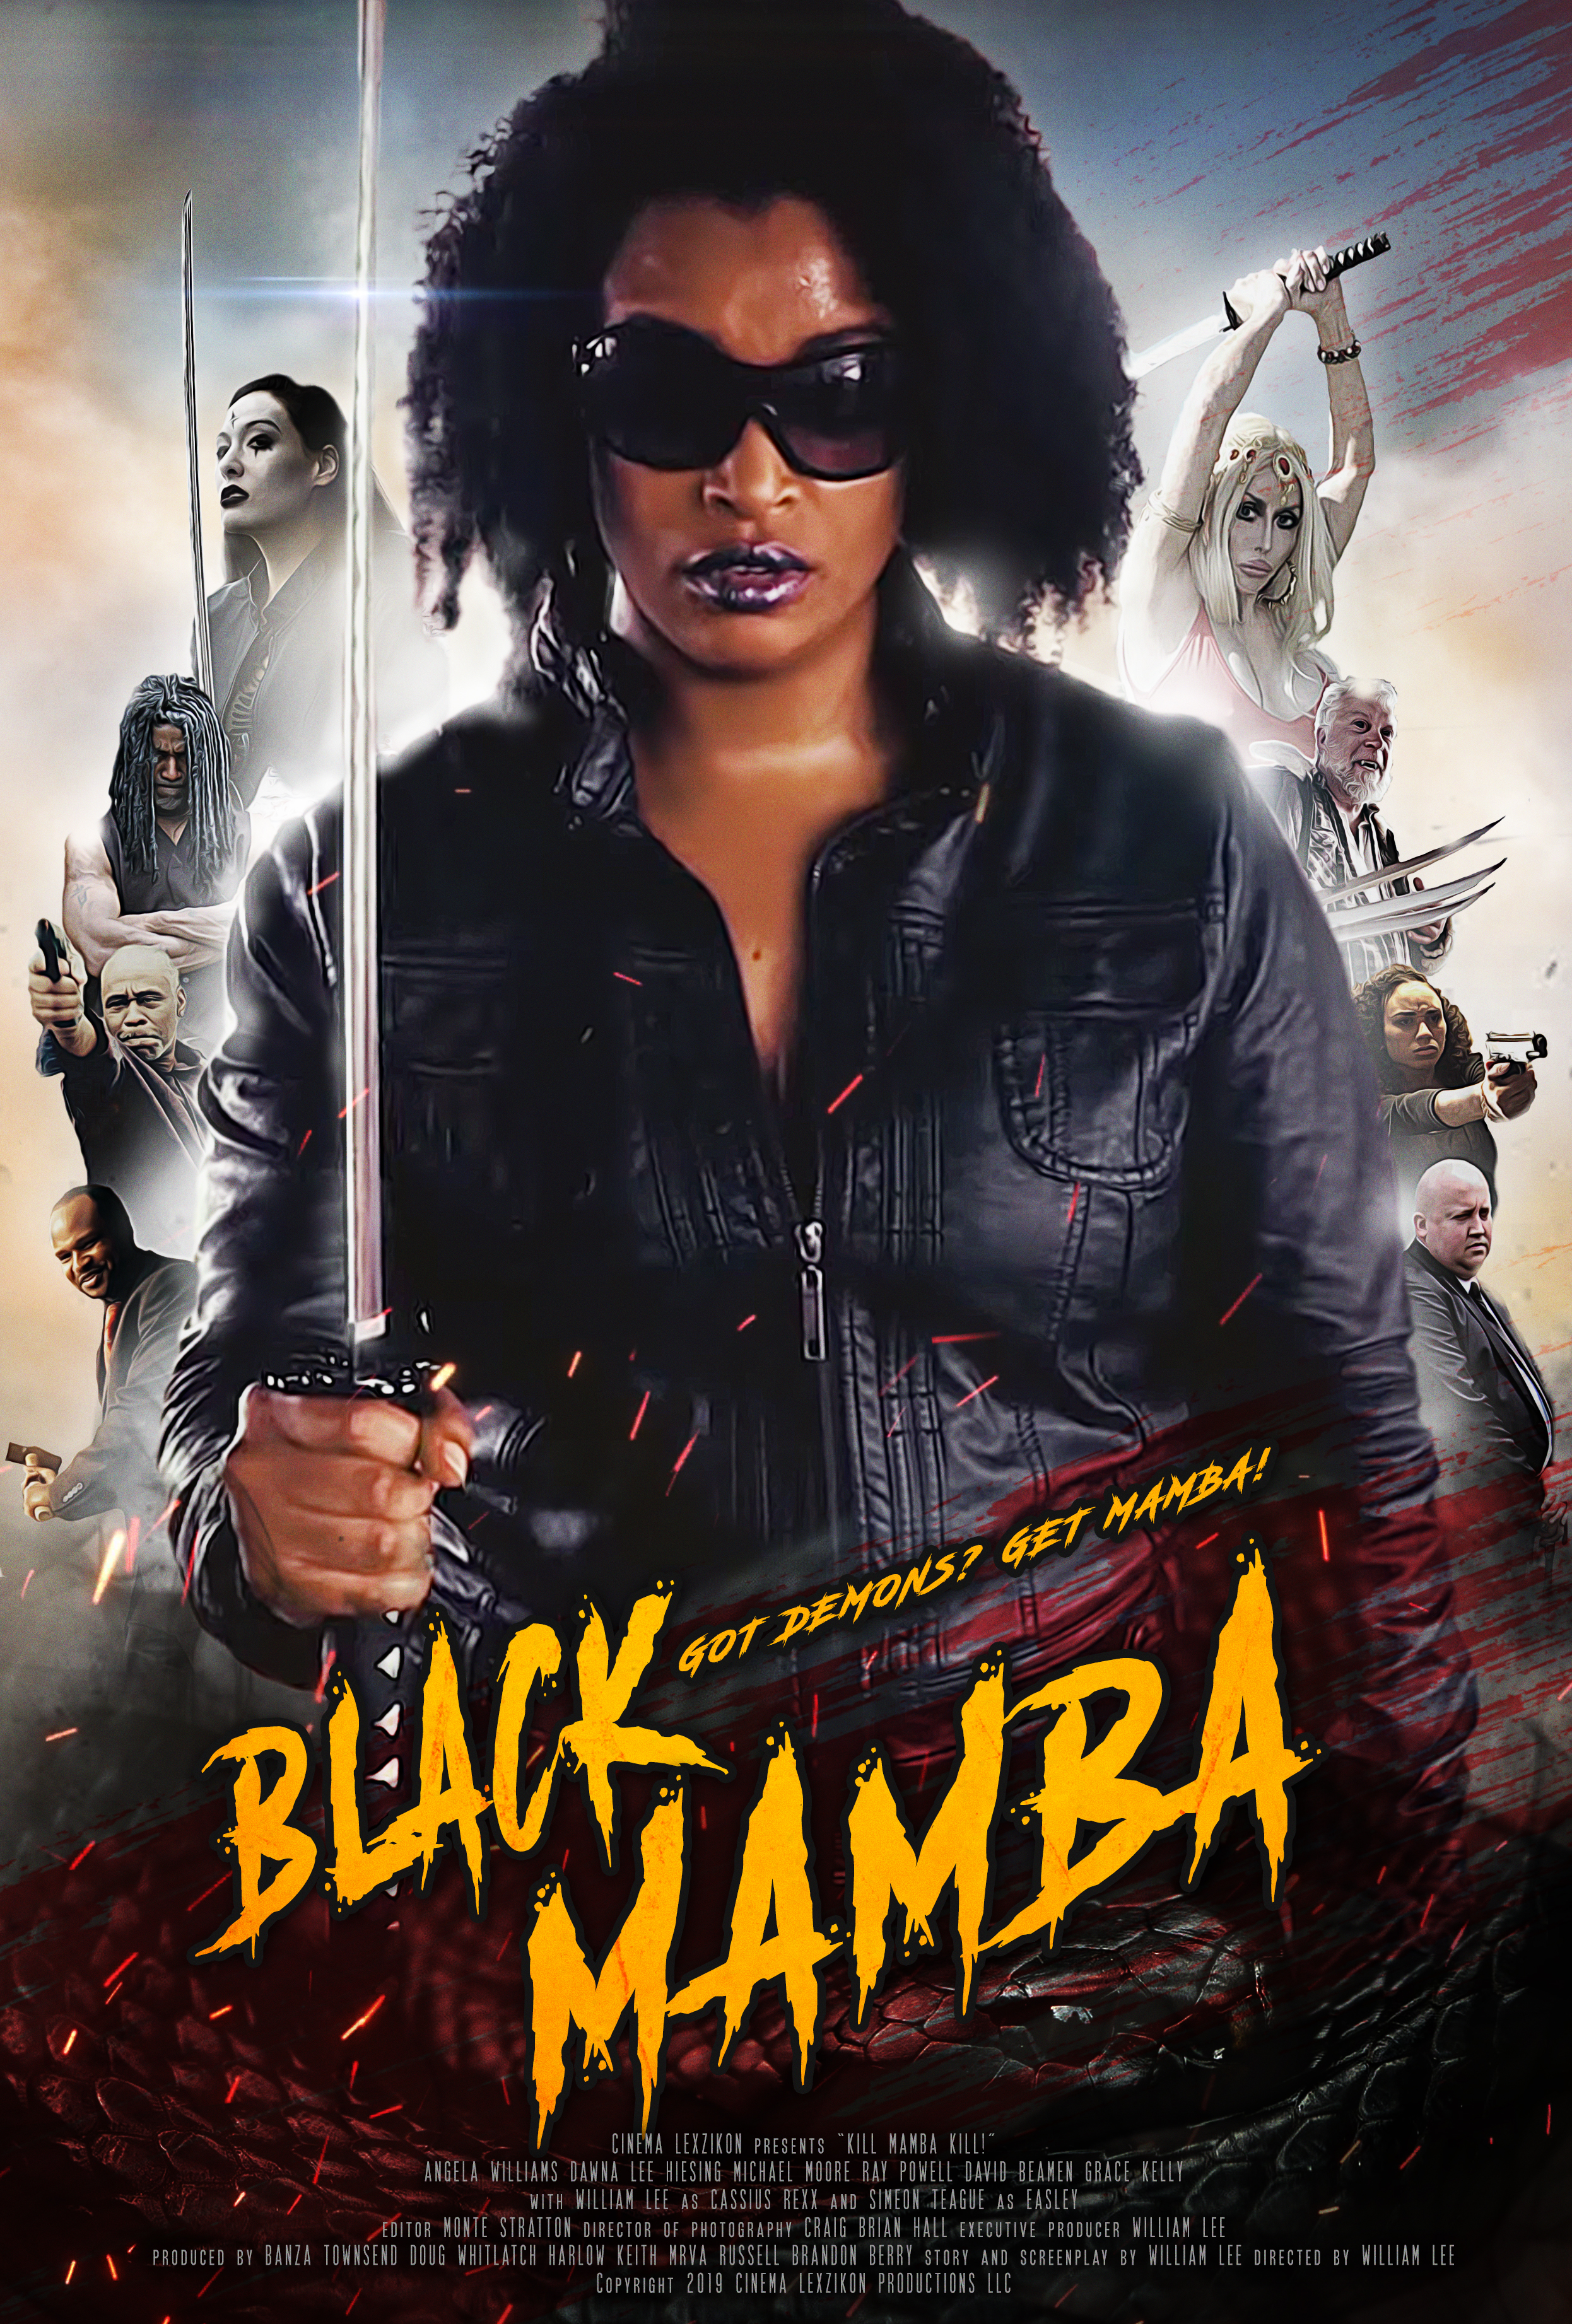 Black Mambafinal